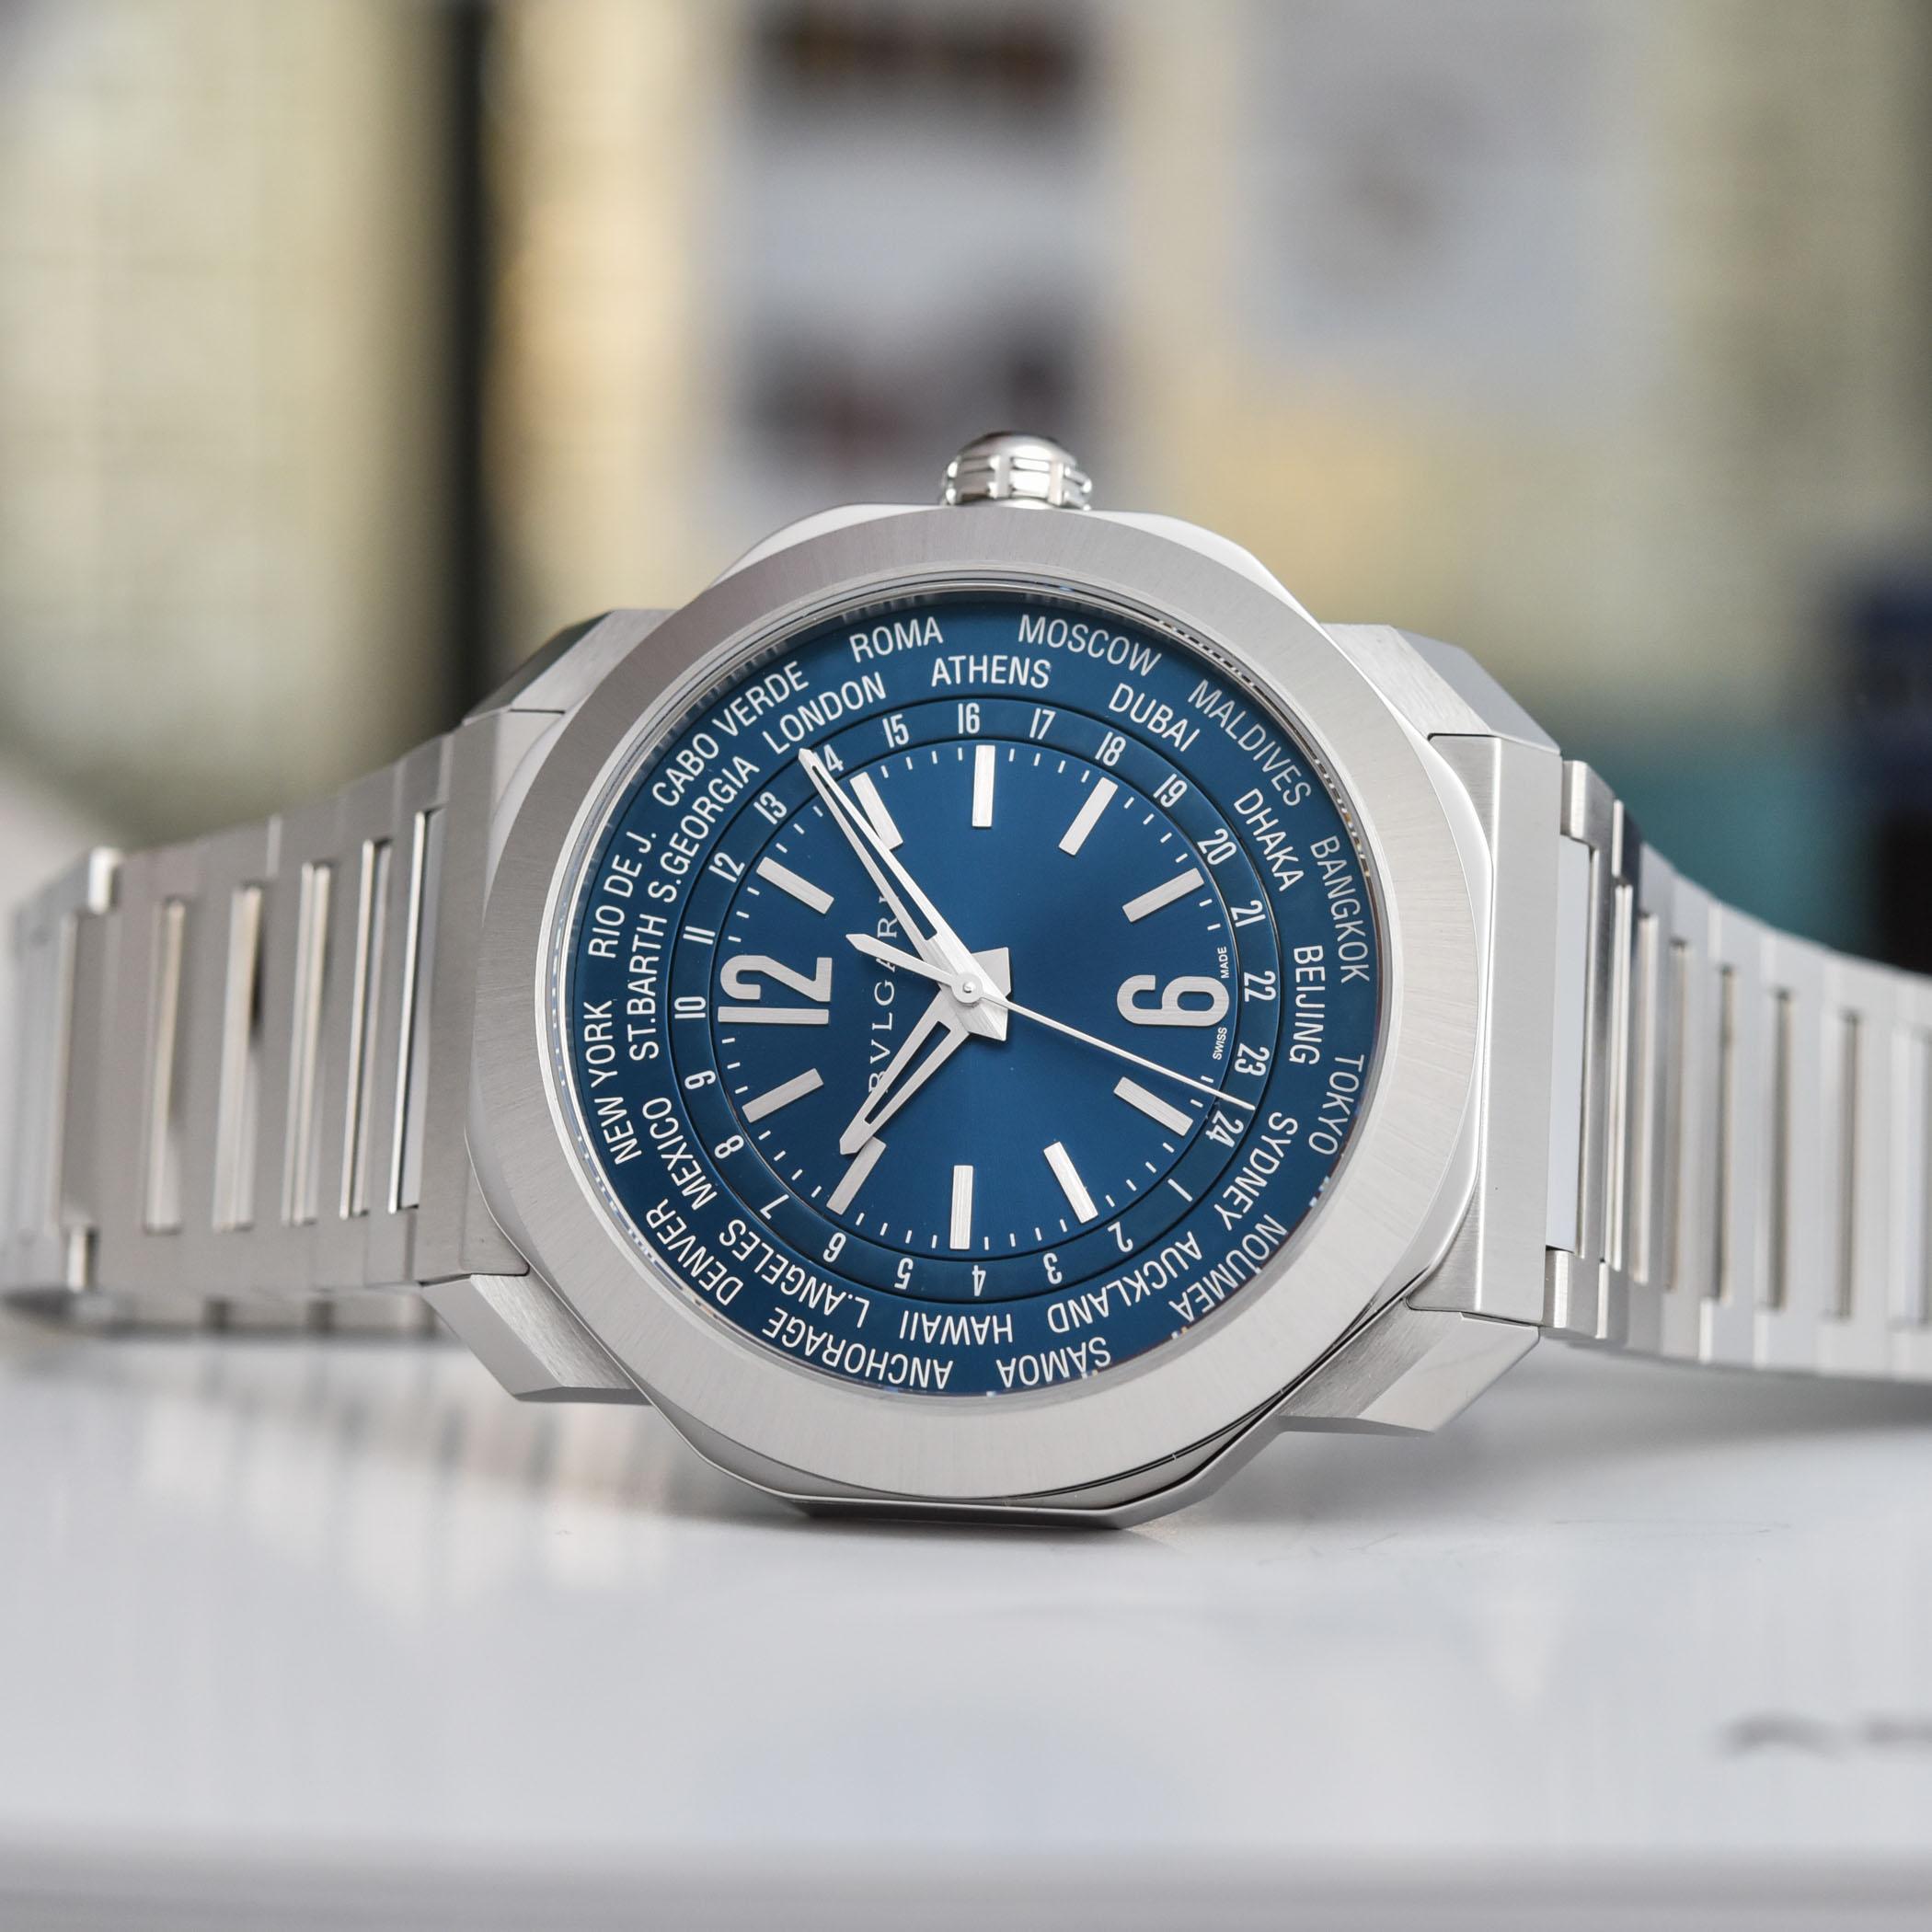 2021 Bulgari Octo Roma Worldtimer Steel Blue Dial